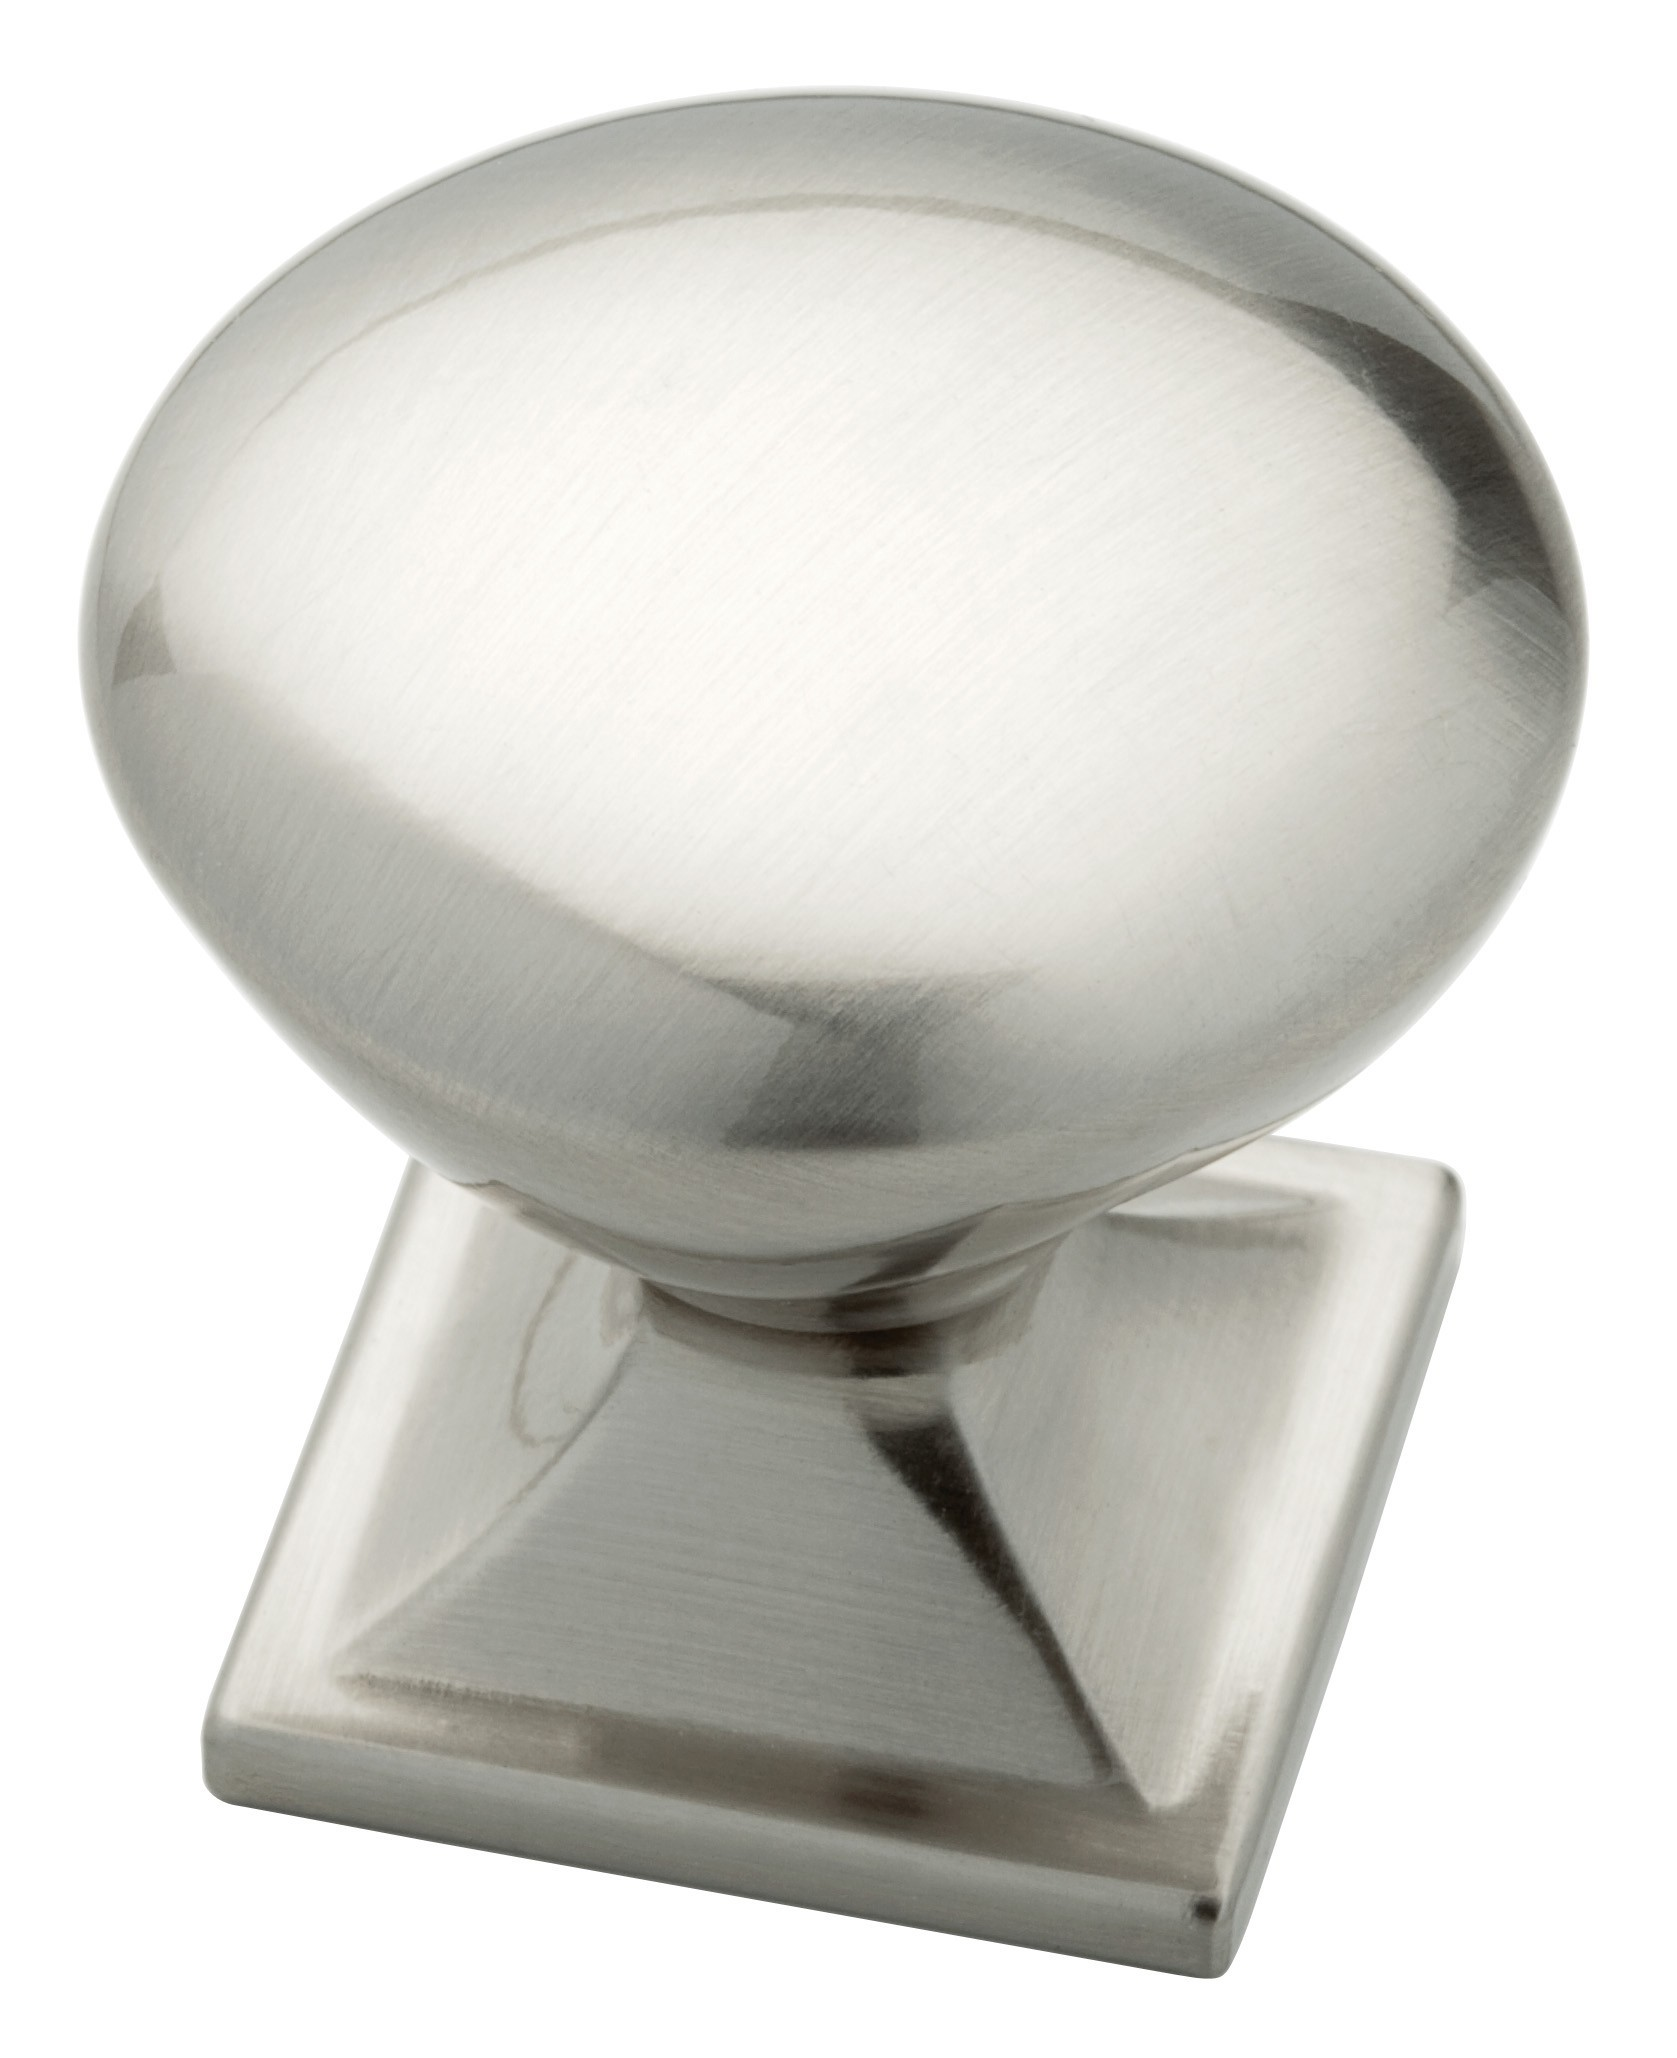 Liberty Hardware P20387-SN-C, 1-1/4 (32mm) Round Knob With Square Base, Zinc Die Cast Knob, Satin Nickel